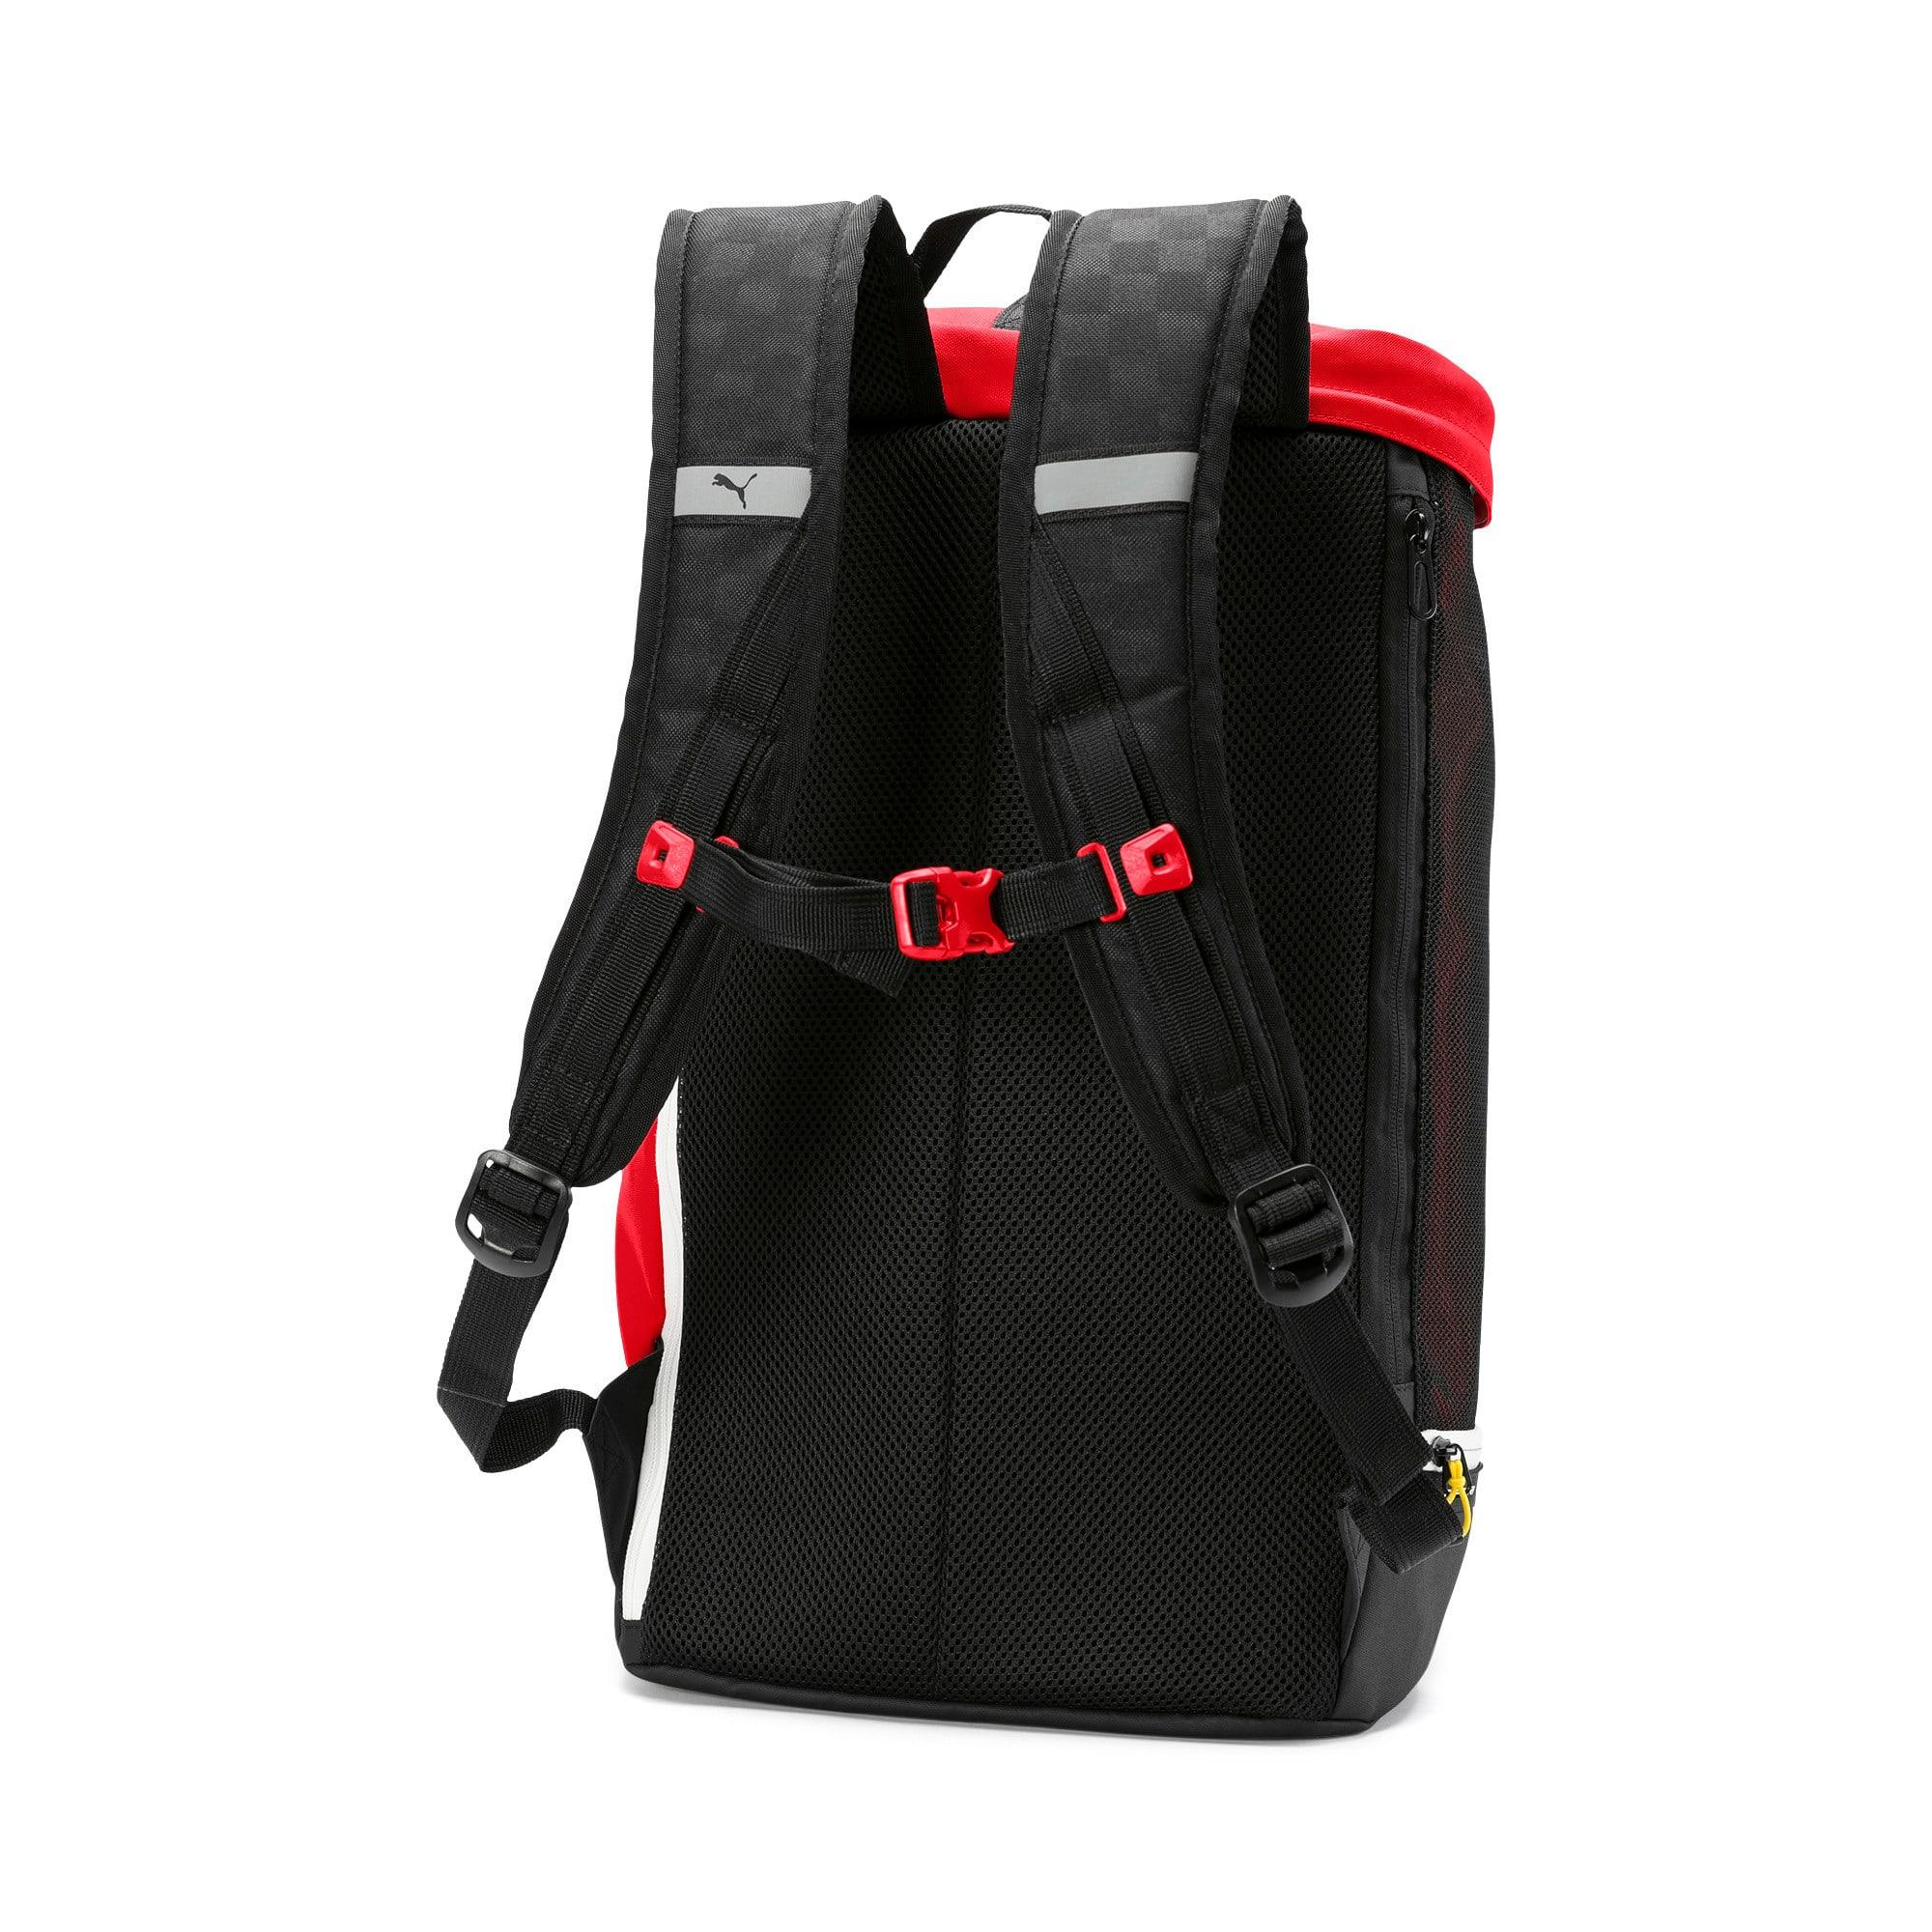 Thumbnail 2 of Ferrari Fanwear RCT Backpack, Rosso Corsa, medium